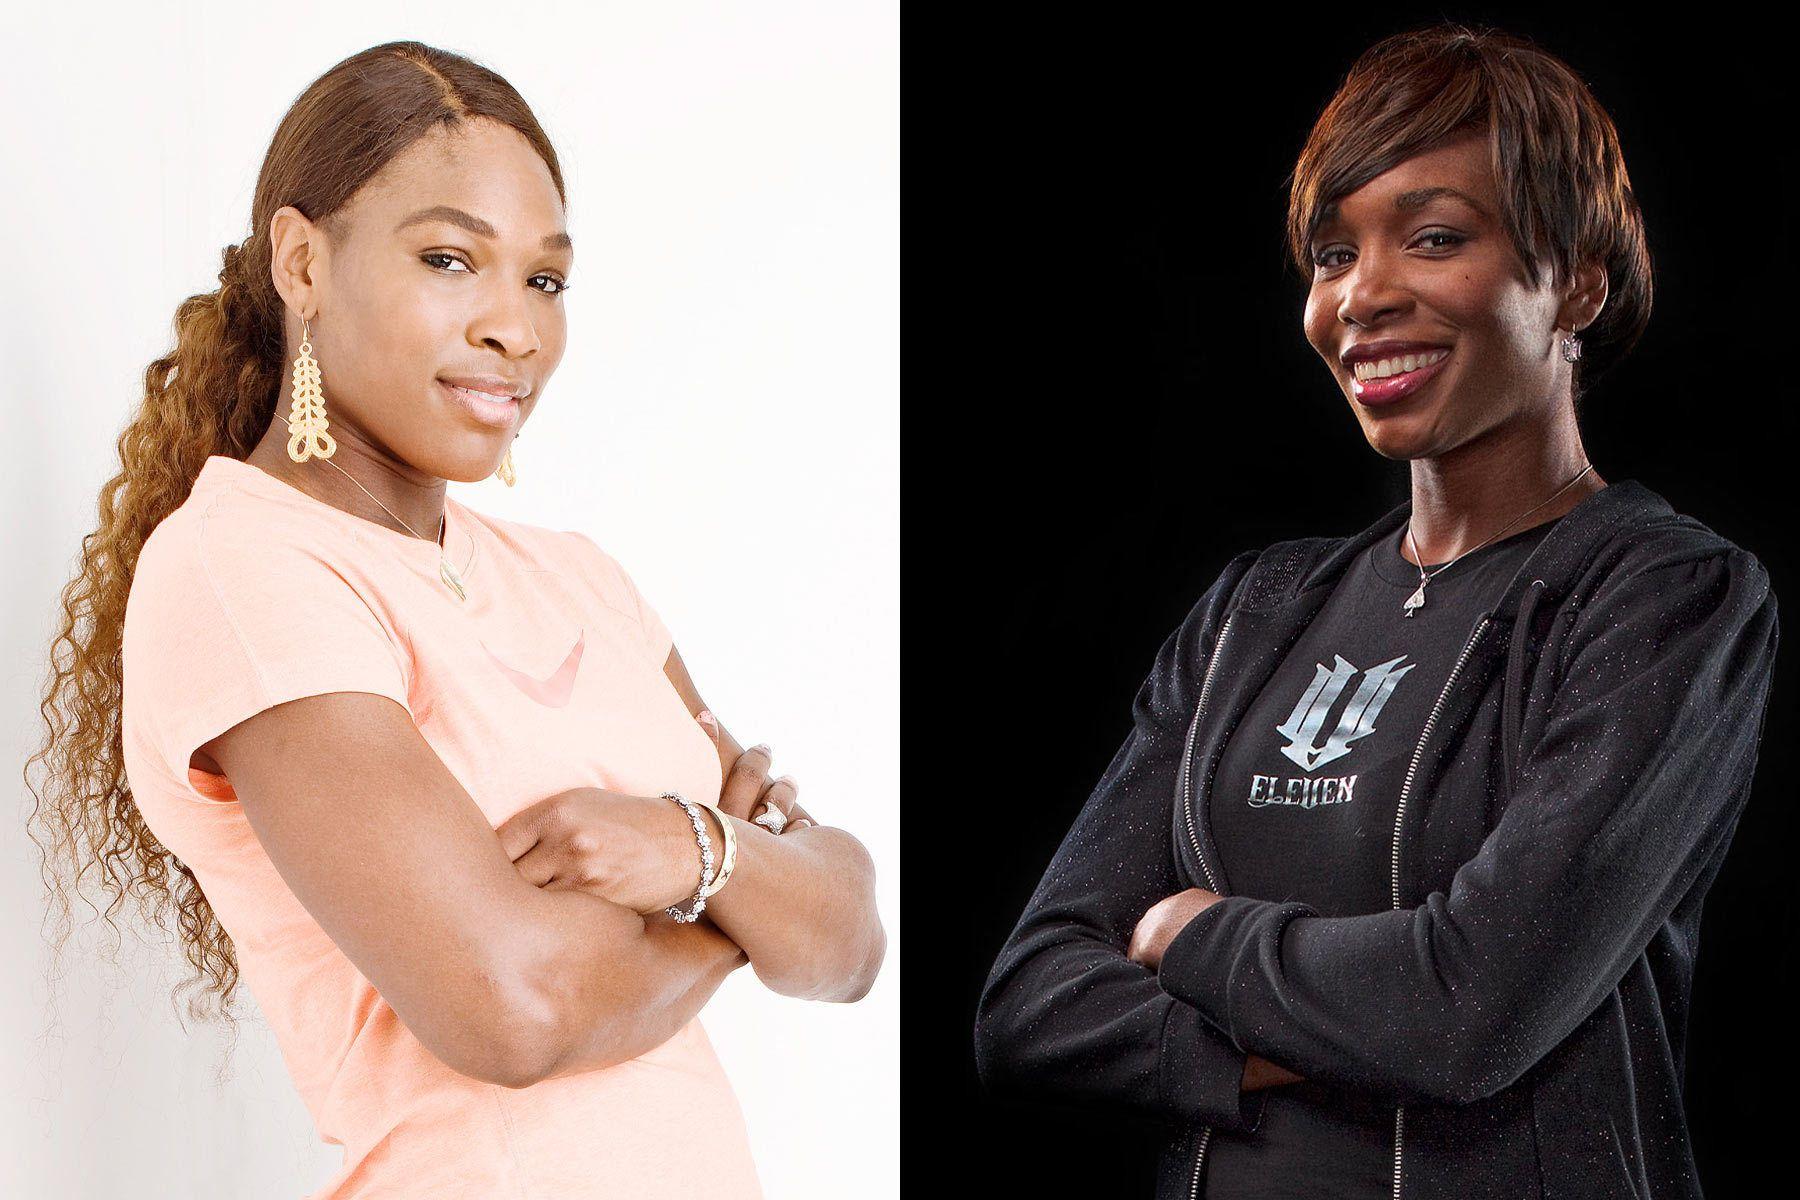 Serena and Venus WilliamsTennis LegendsSistersUSTA Miami, FL